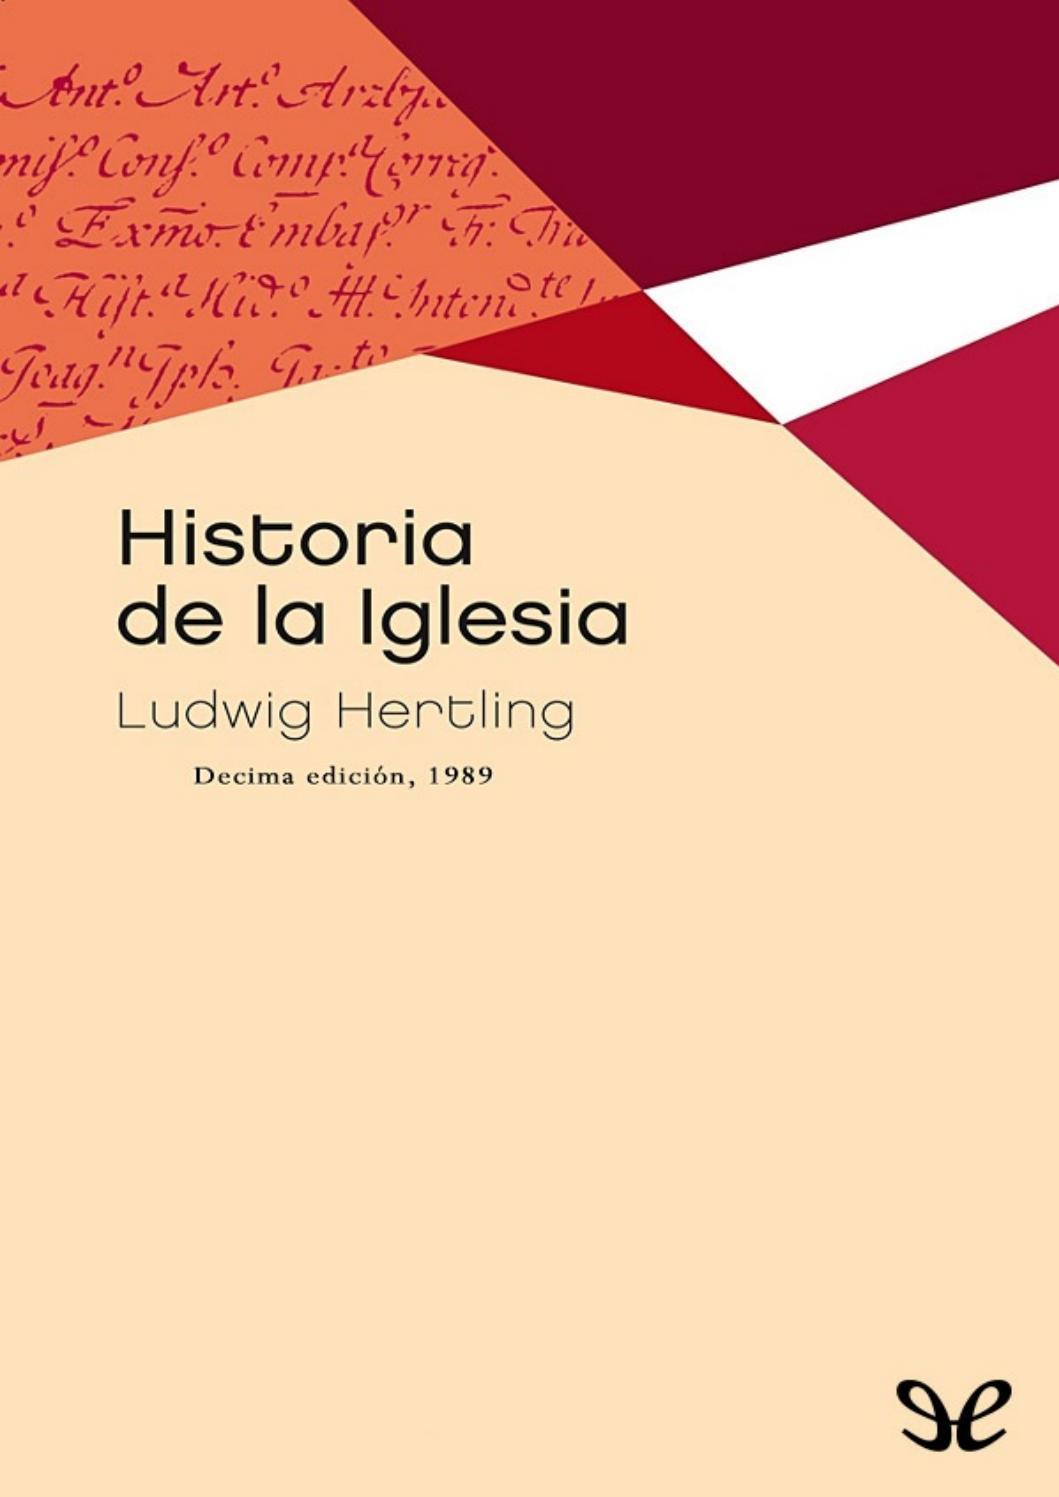 Lhig by La Cartoleria - issuu